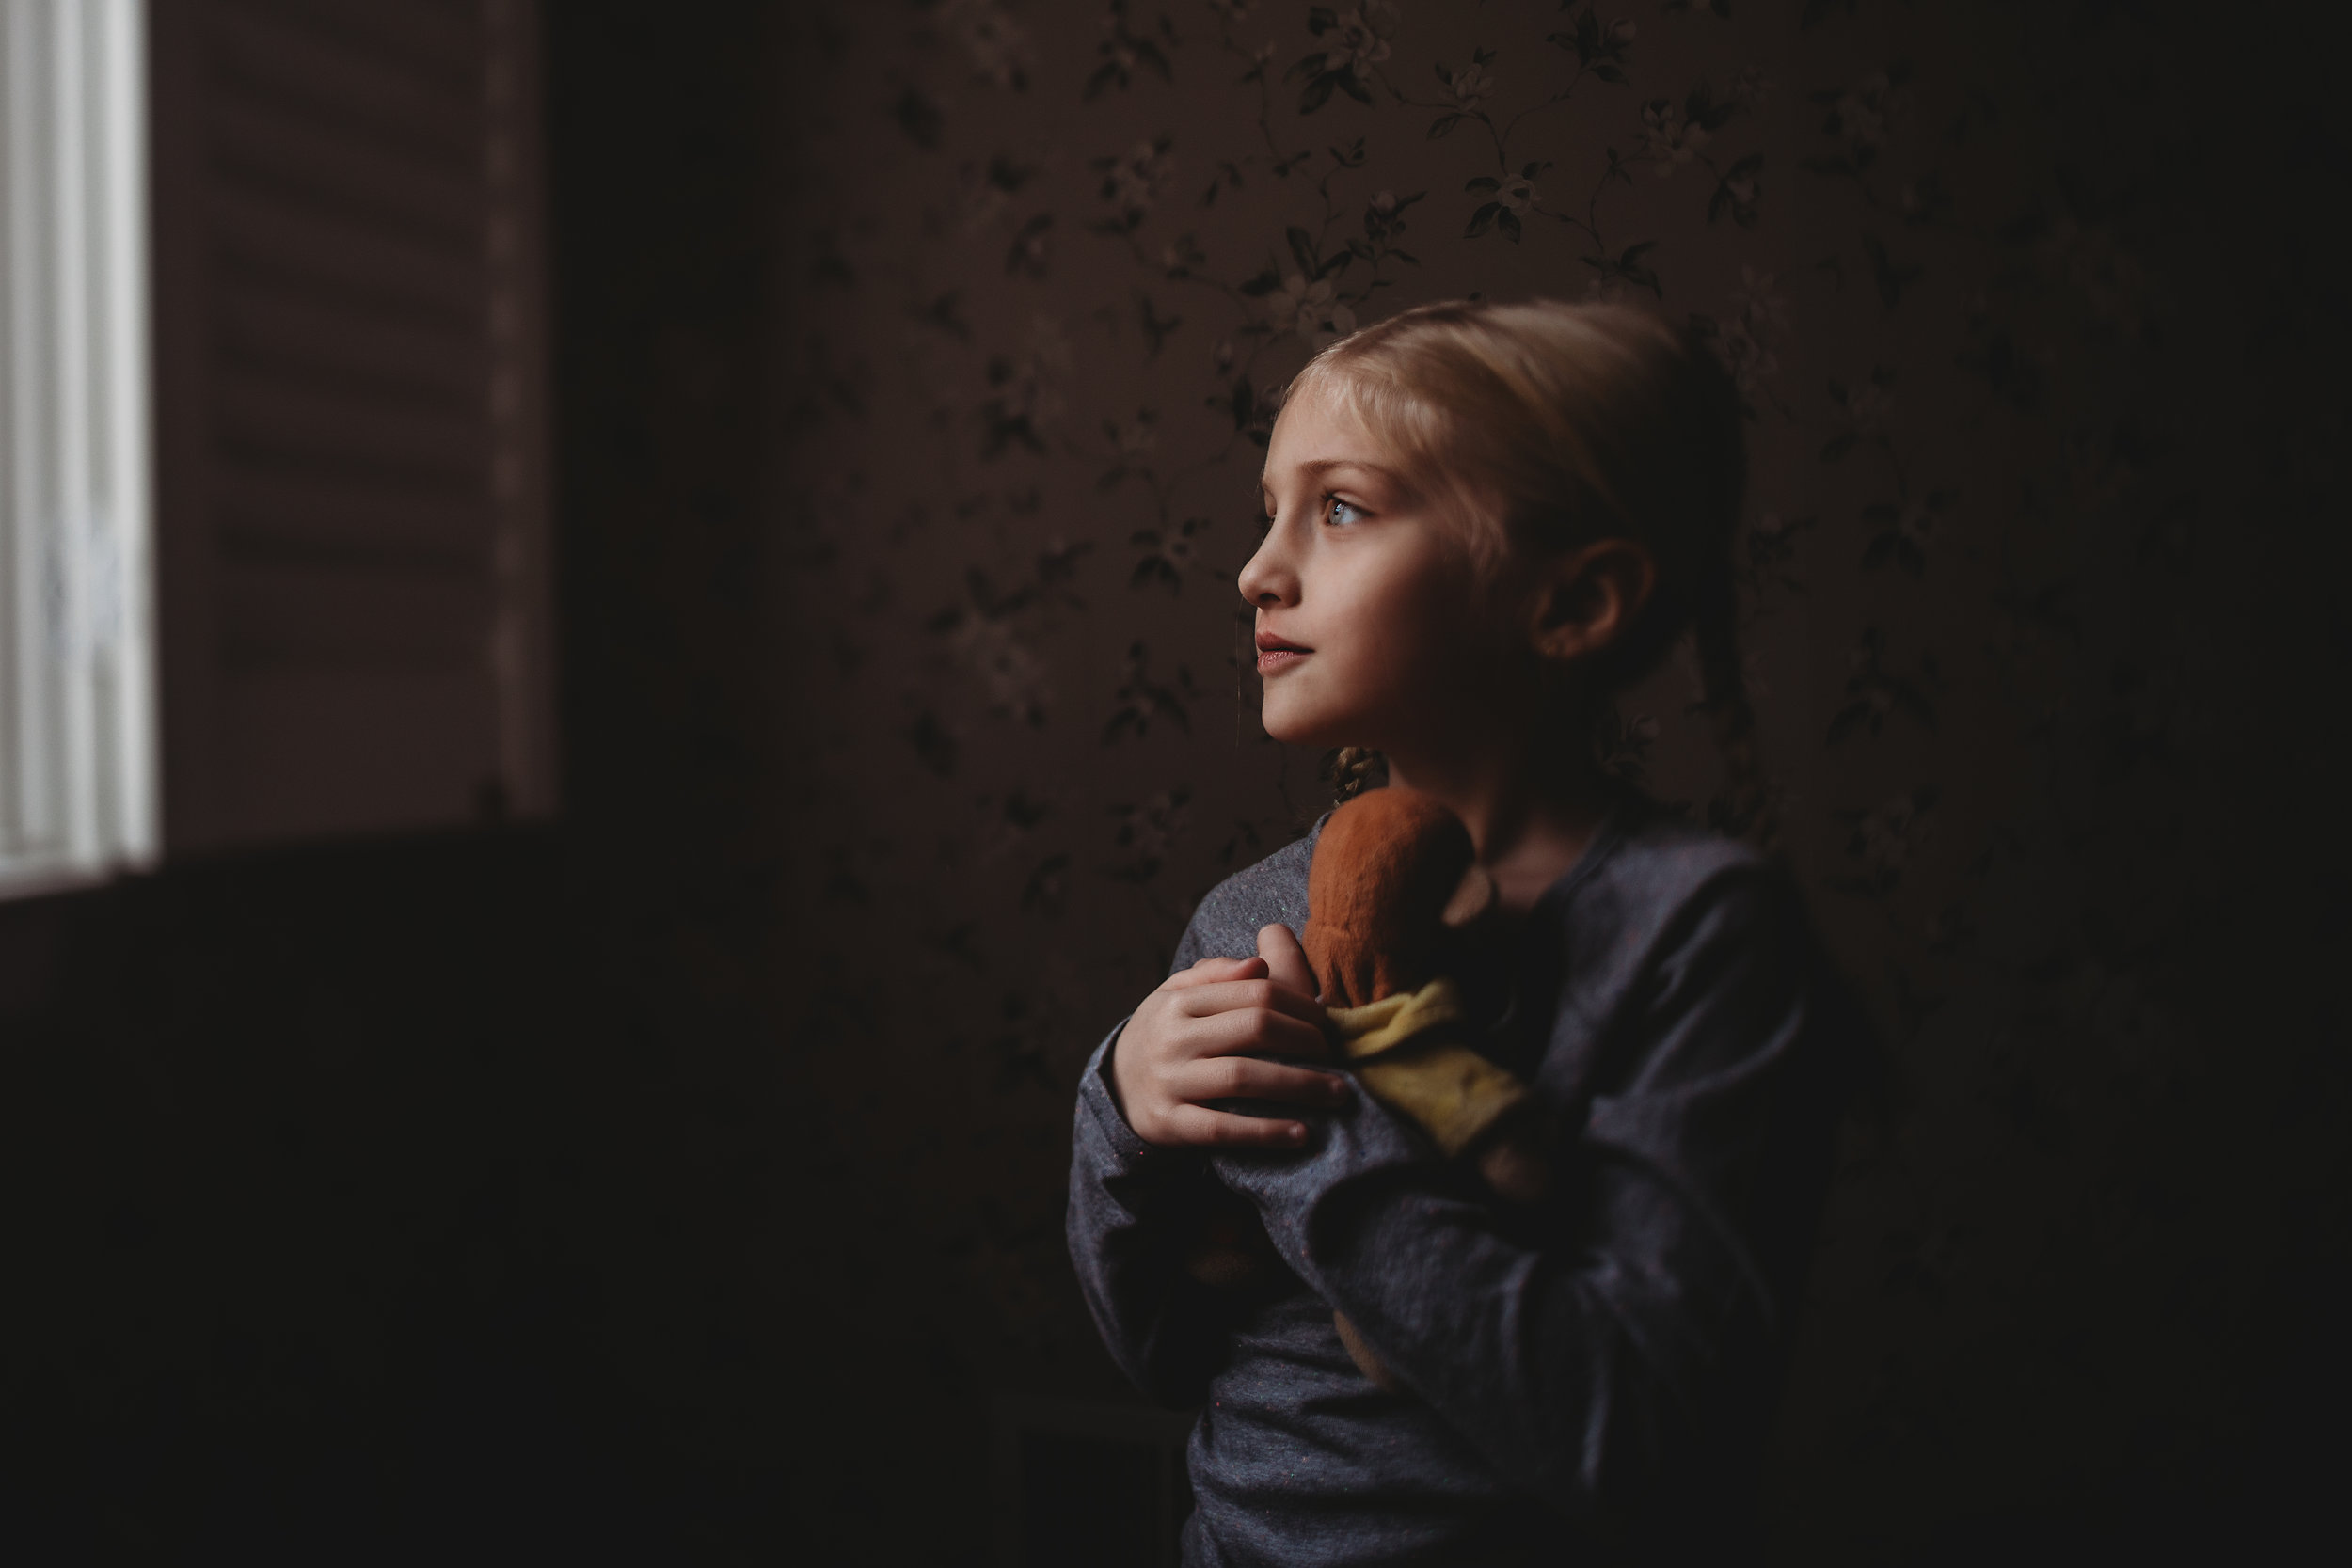 hello-olivia-photography-long-island-photographer-lifestyle-suffolk-child-window-light-stuffed-animal.jpg